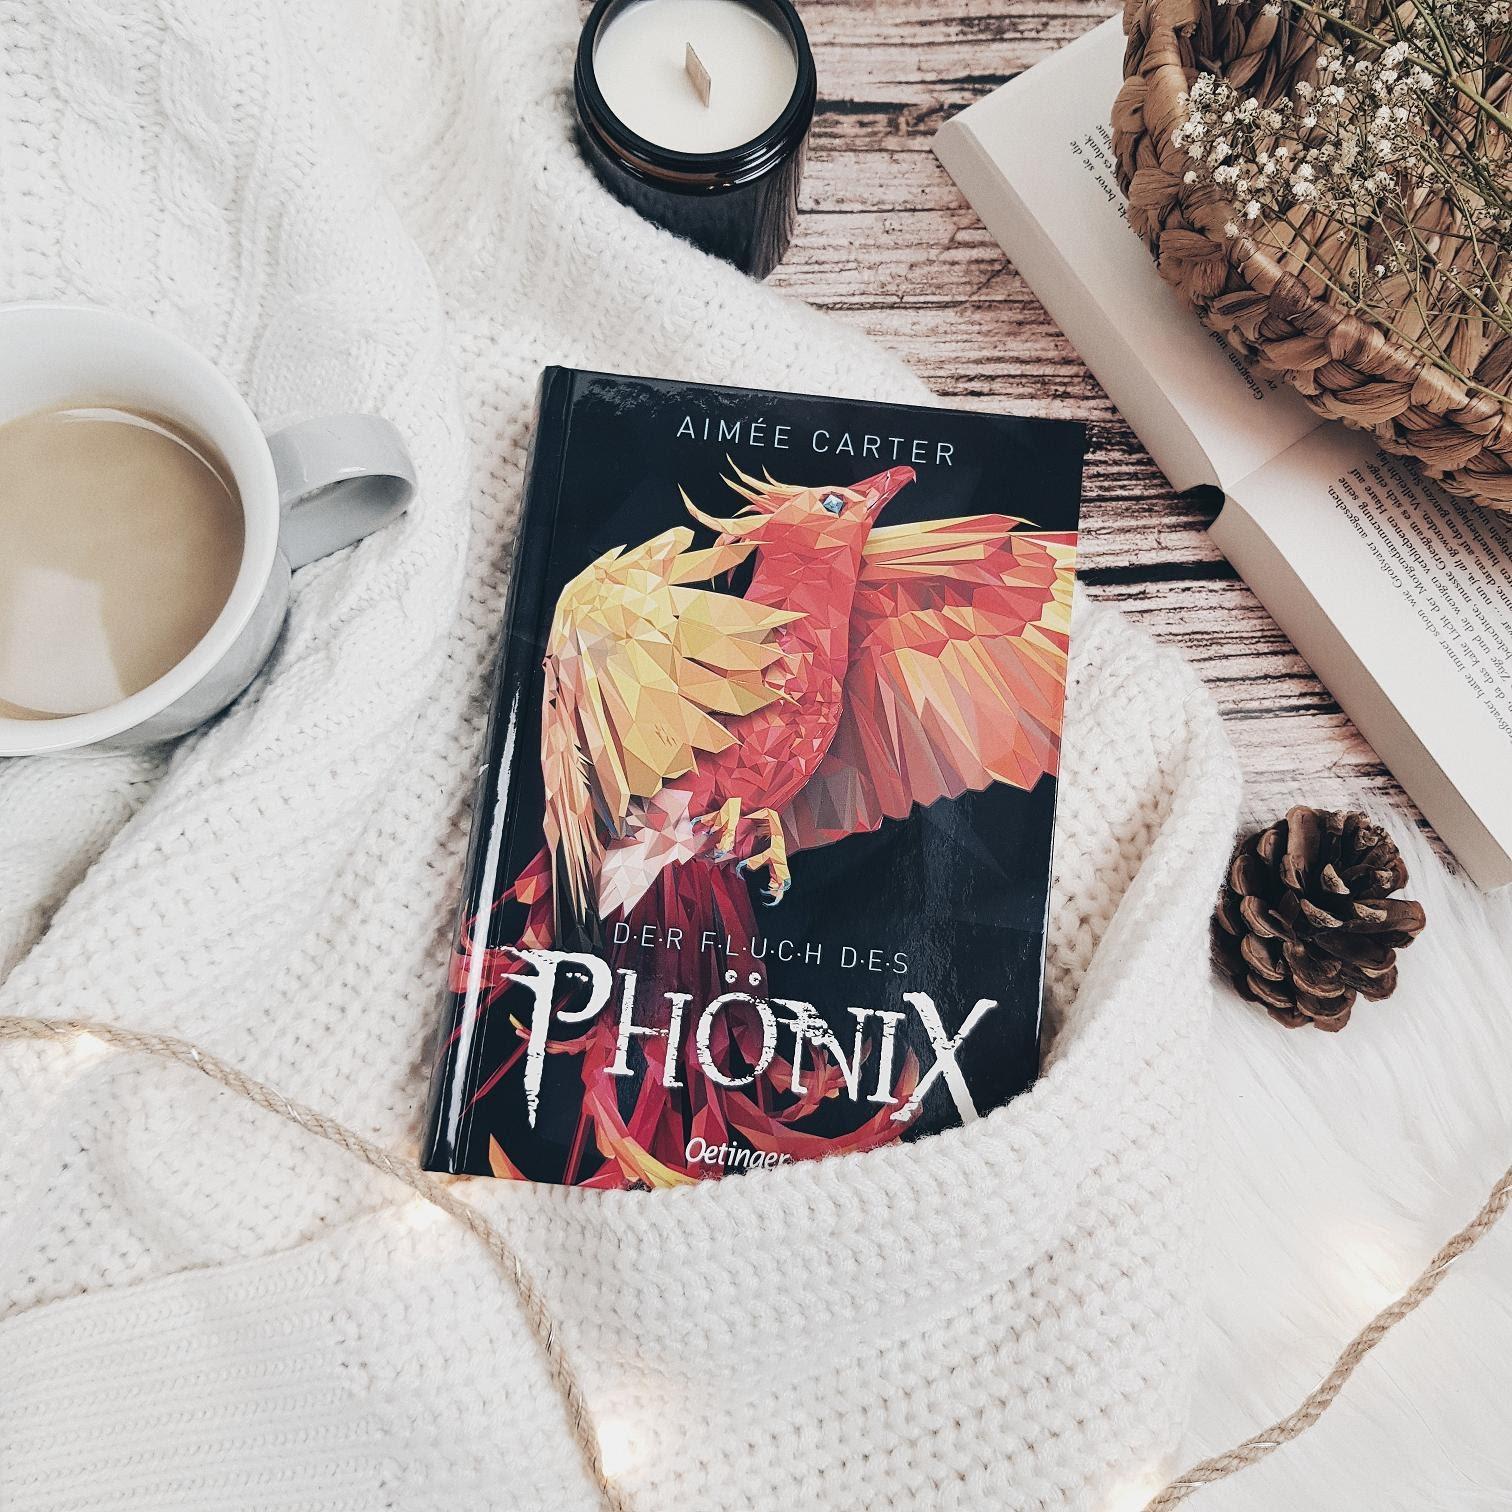 Bücherblog. Rezension. Buchcover. Der Fluch des Phönix von Aimée Carter. Kinderbuch. Fantasy. Verlagsgruppe Oetinger.